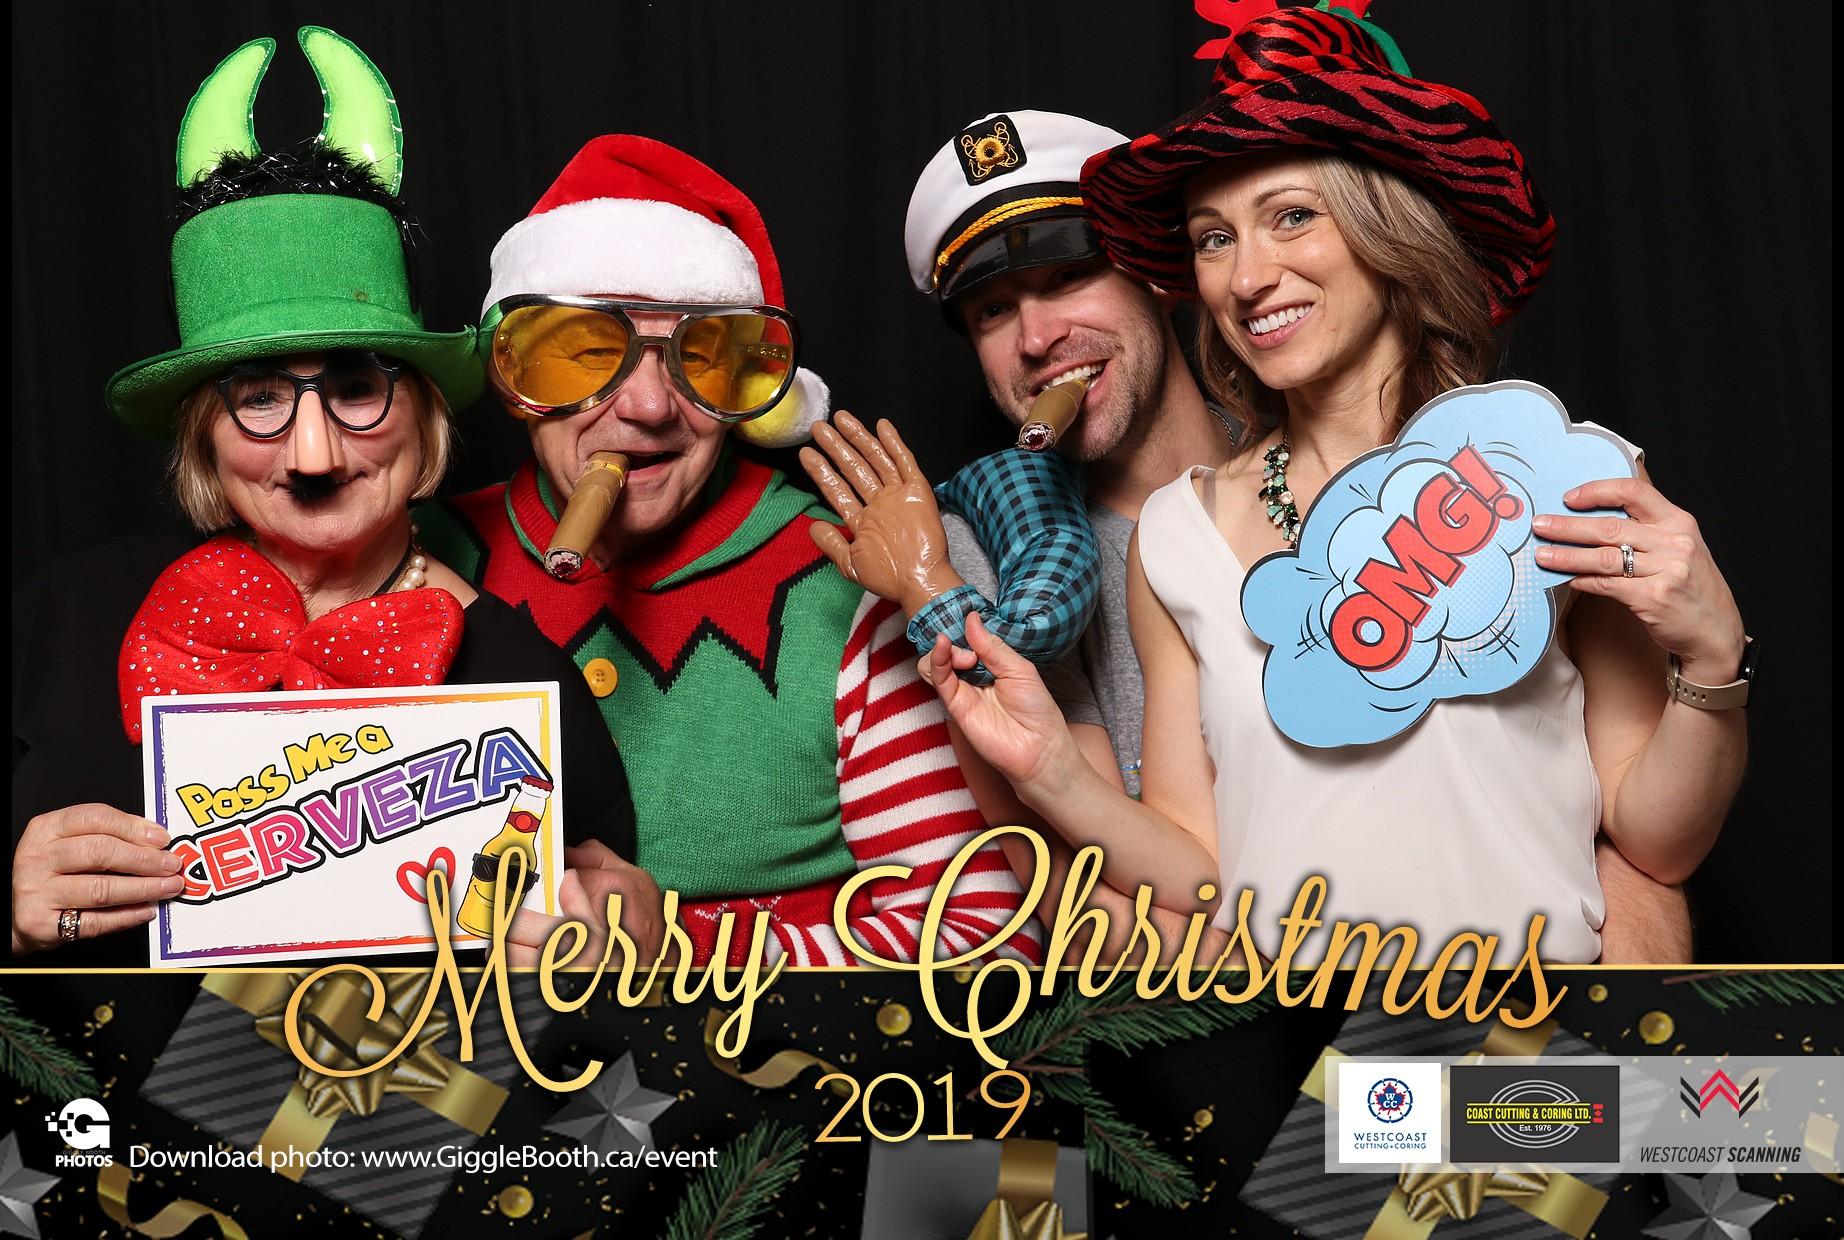 West Coast Cutting - Christmas 2019